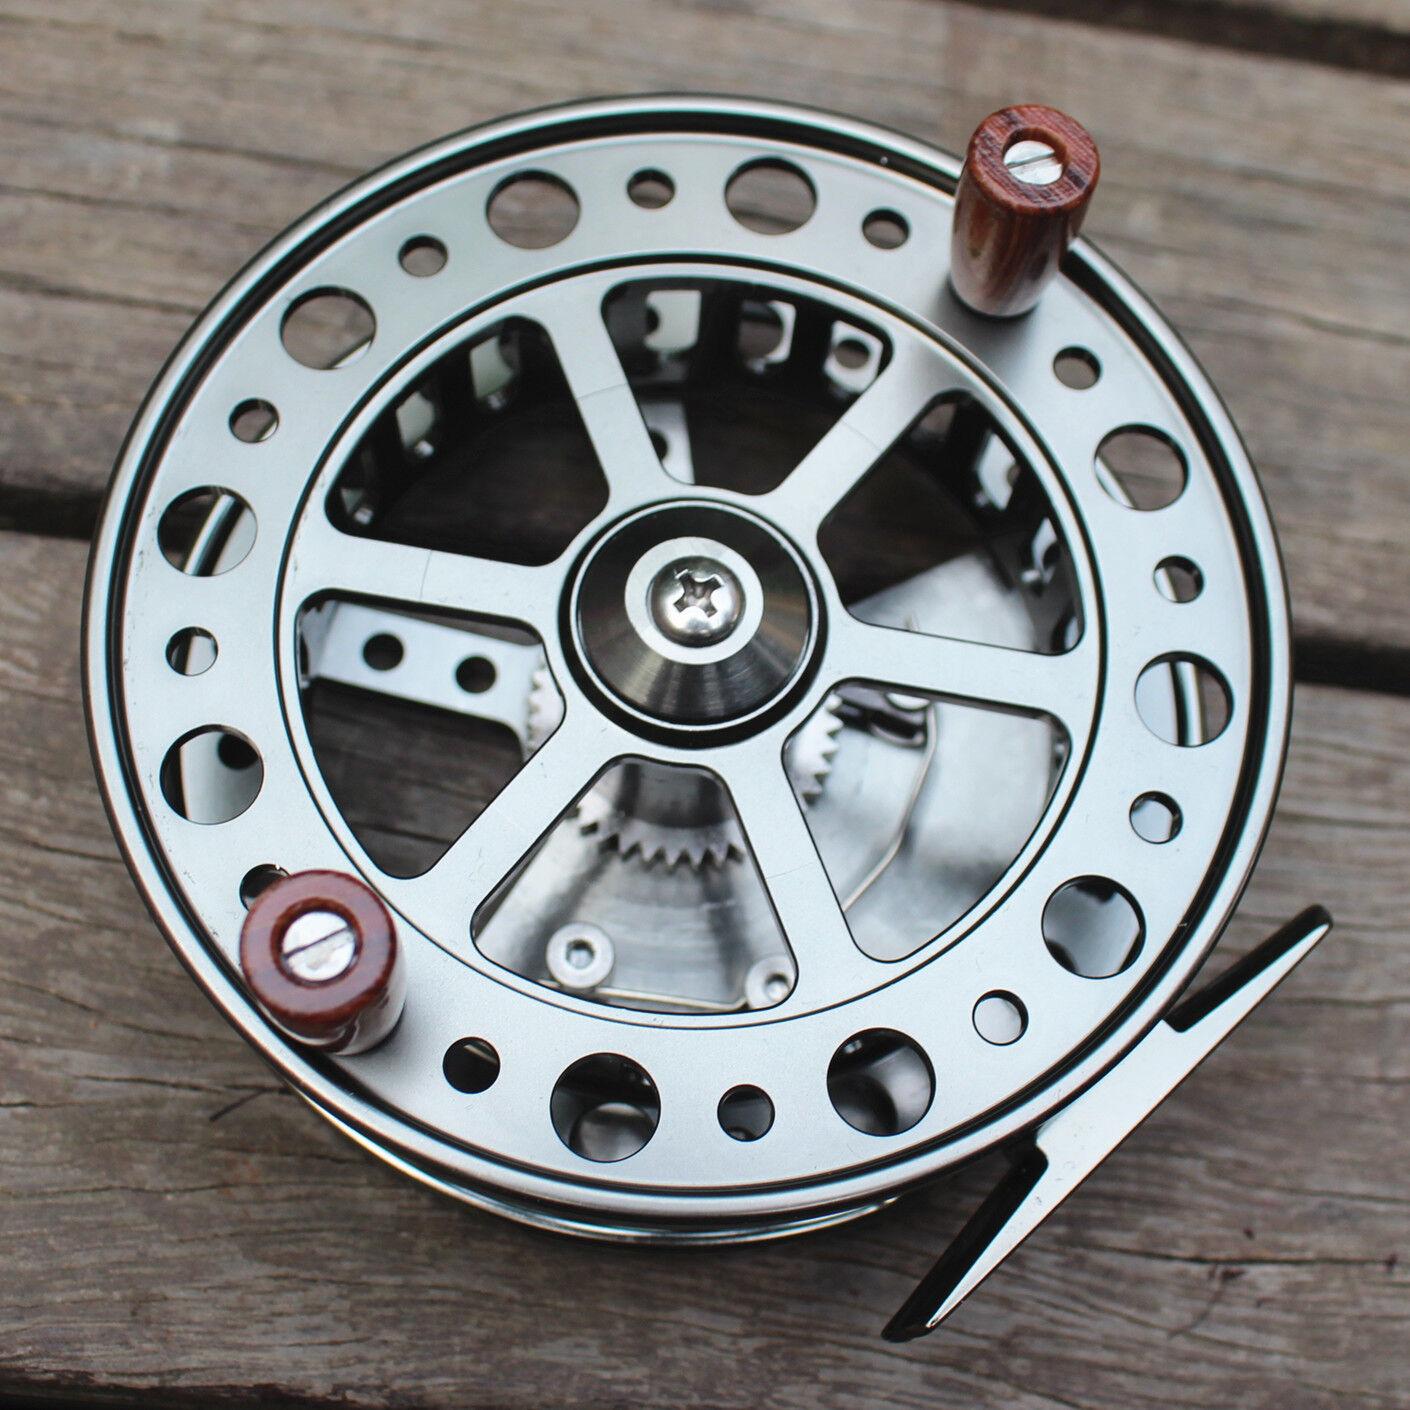 CENTREPIN FLOAT REEL CENTER PIN TredTING REEL 4 1 2 INCHES 113.5mm Diameter